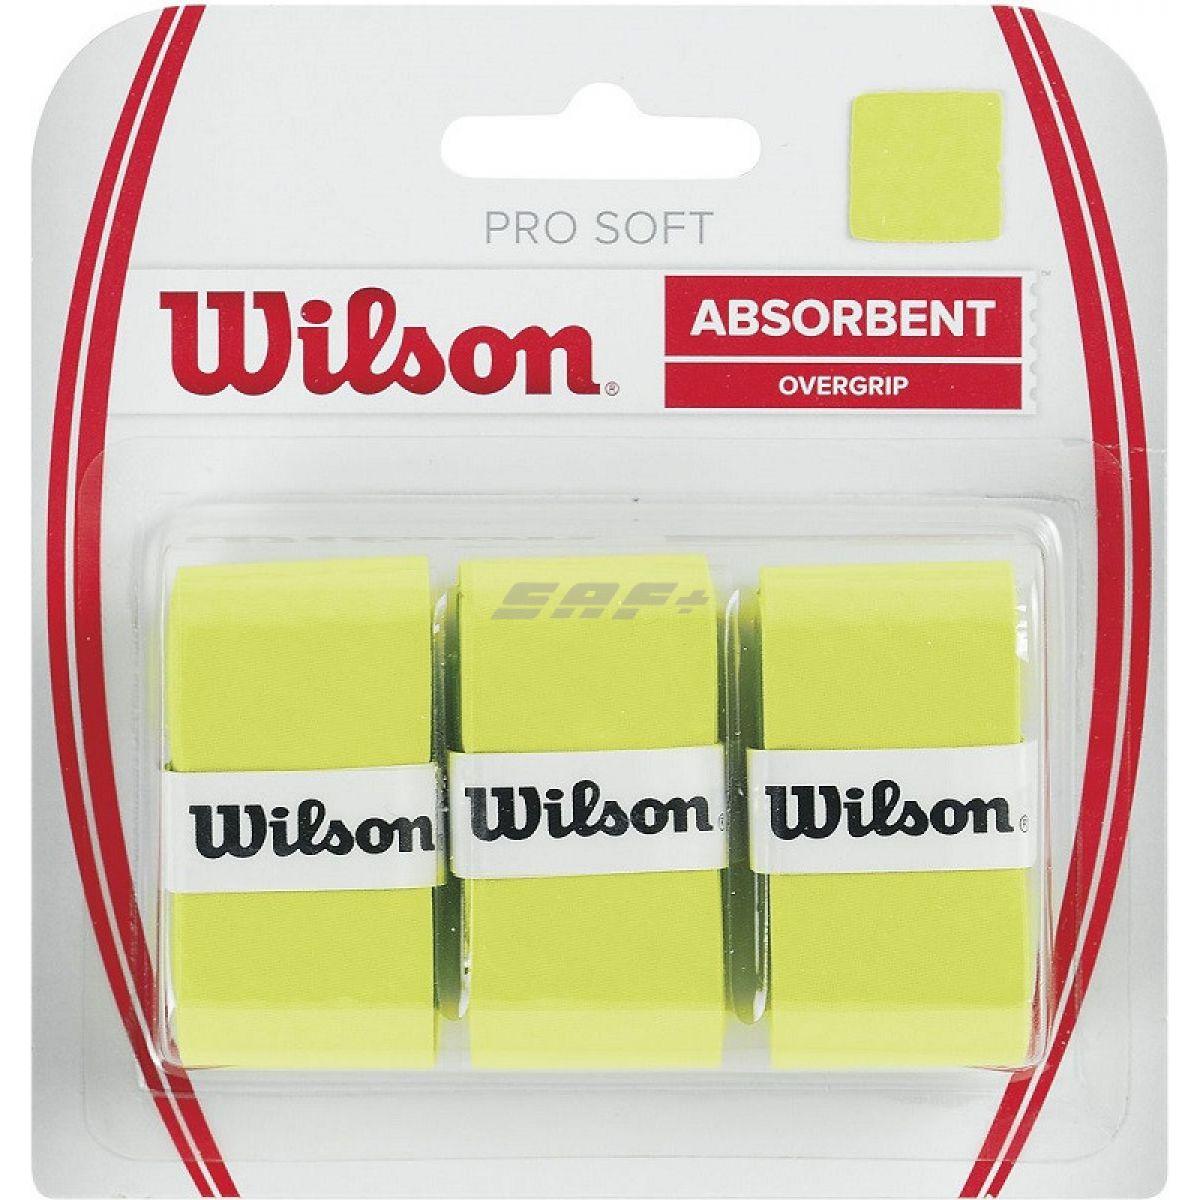 Овергрип Овергрип Wilson Pro Soft Overgrip, арт. WRZ4040LI, 0,5 мм, размер 2,5см*120см,3 шт, салатовый